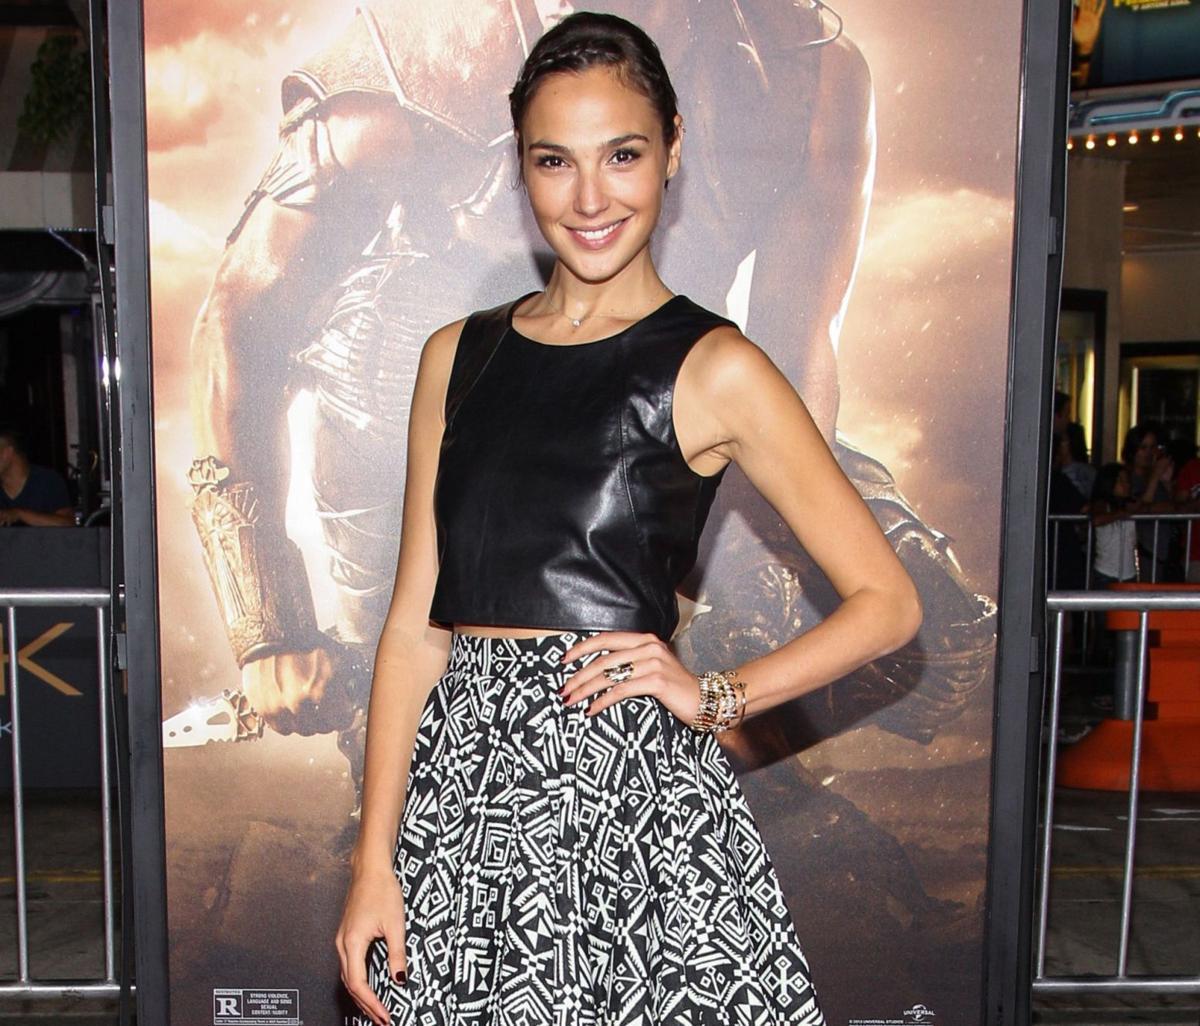 Wonder Woman cast for Batman-Superman film starring Ben Affleck and Henry Cavill